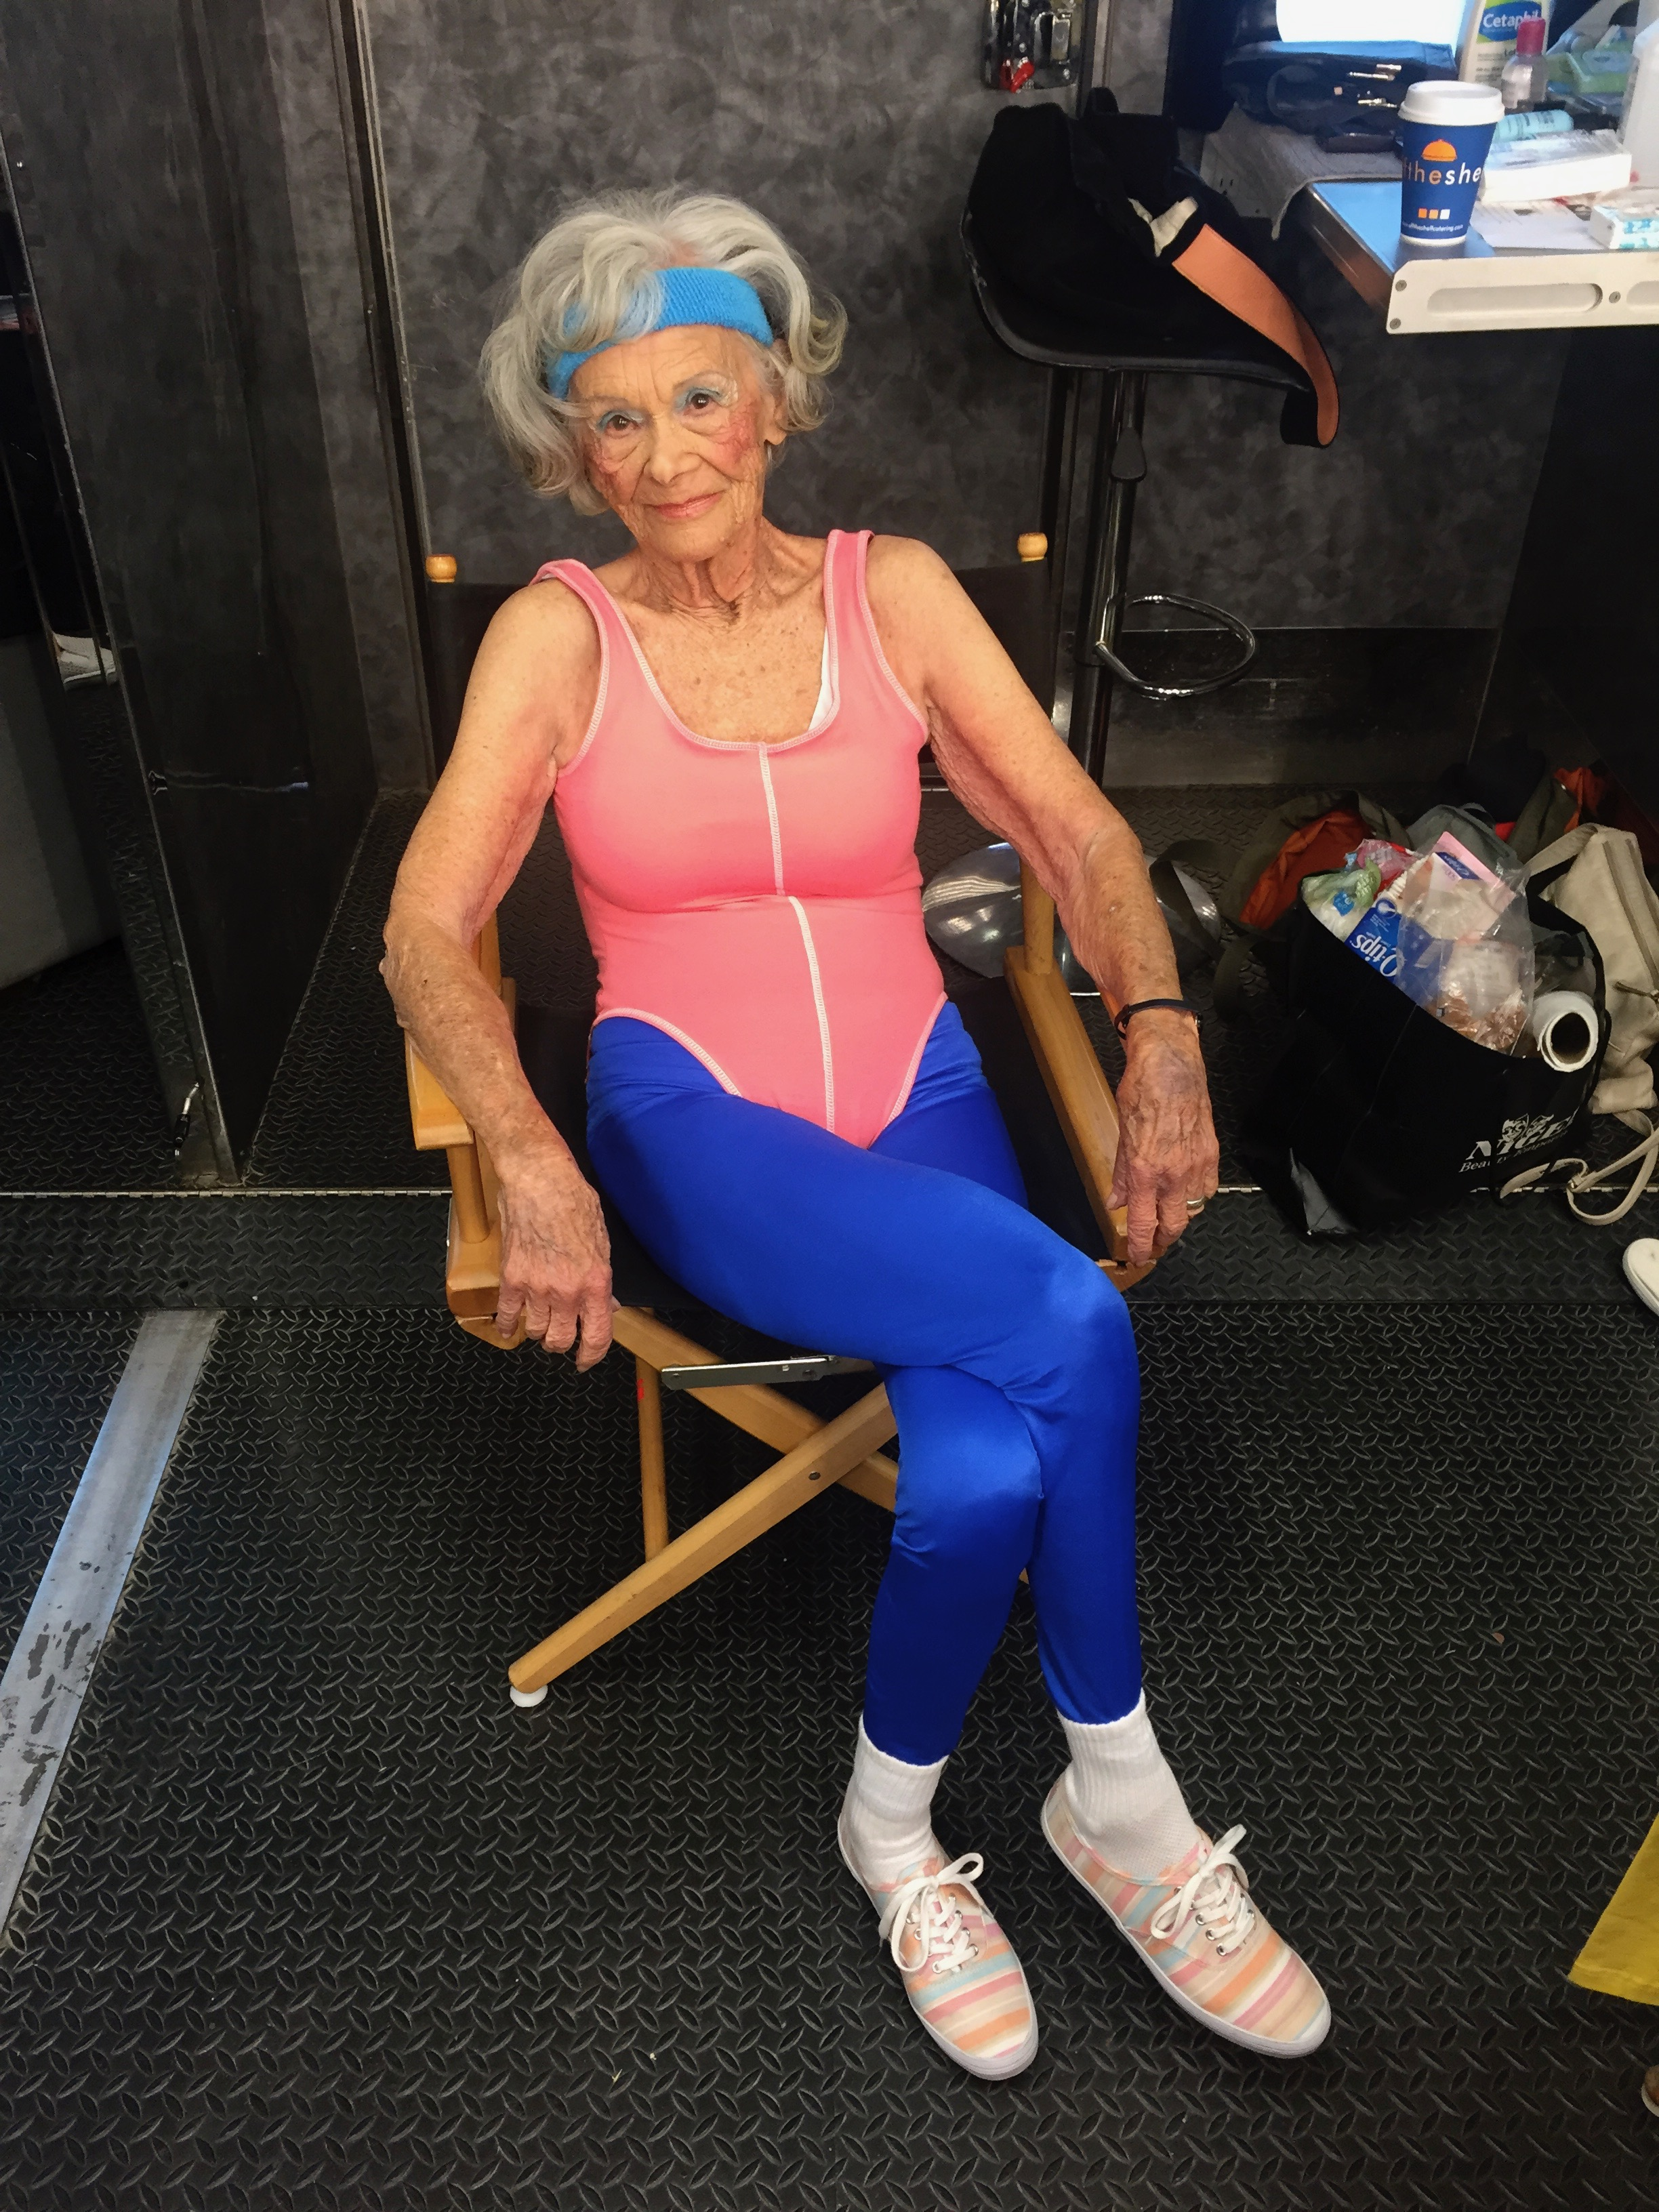 Pharrell music video.